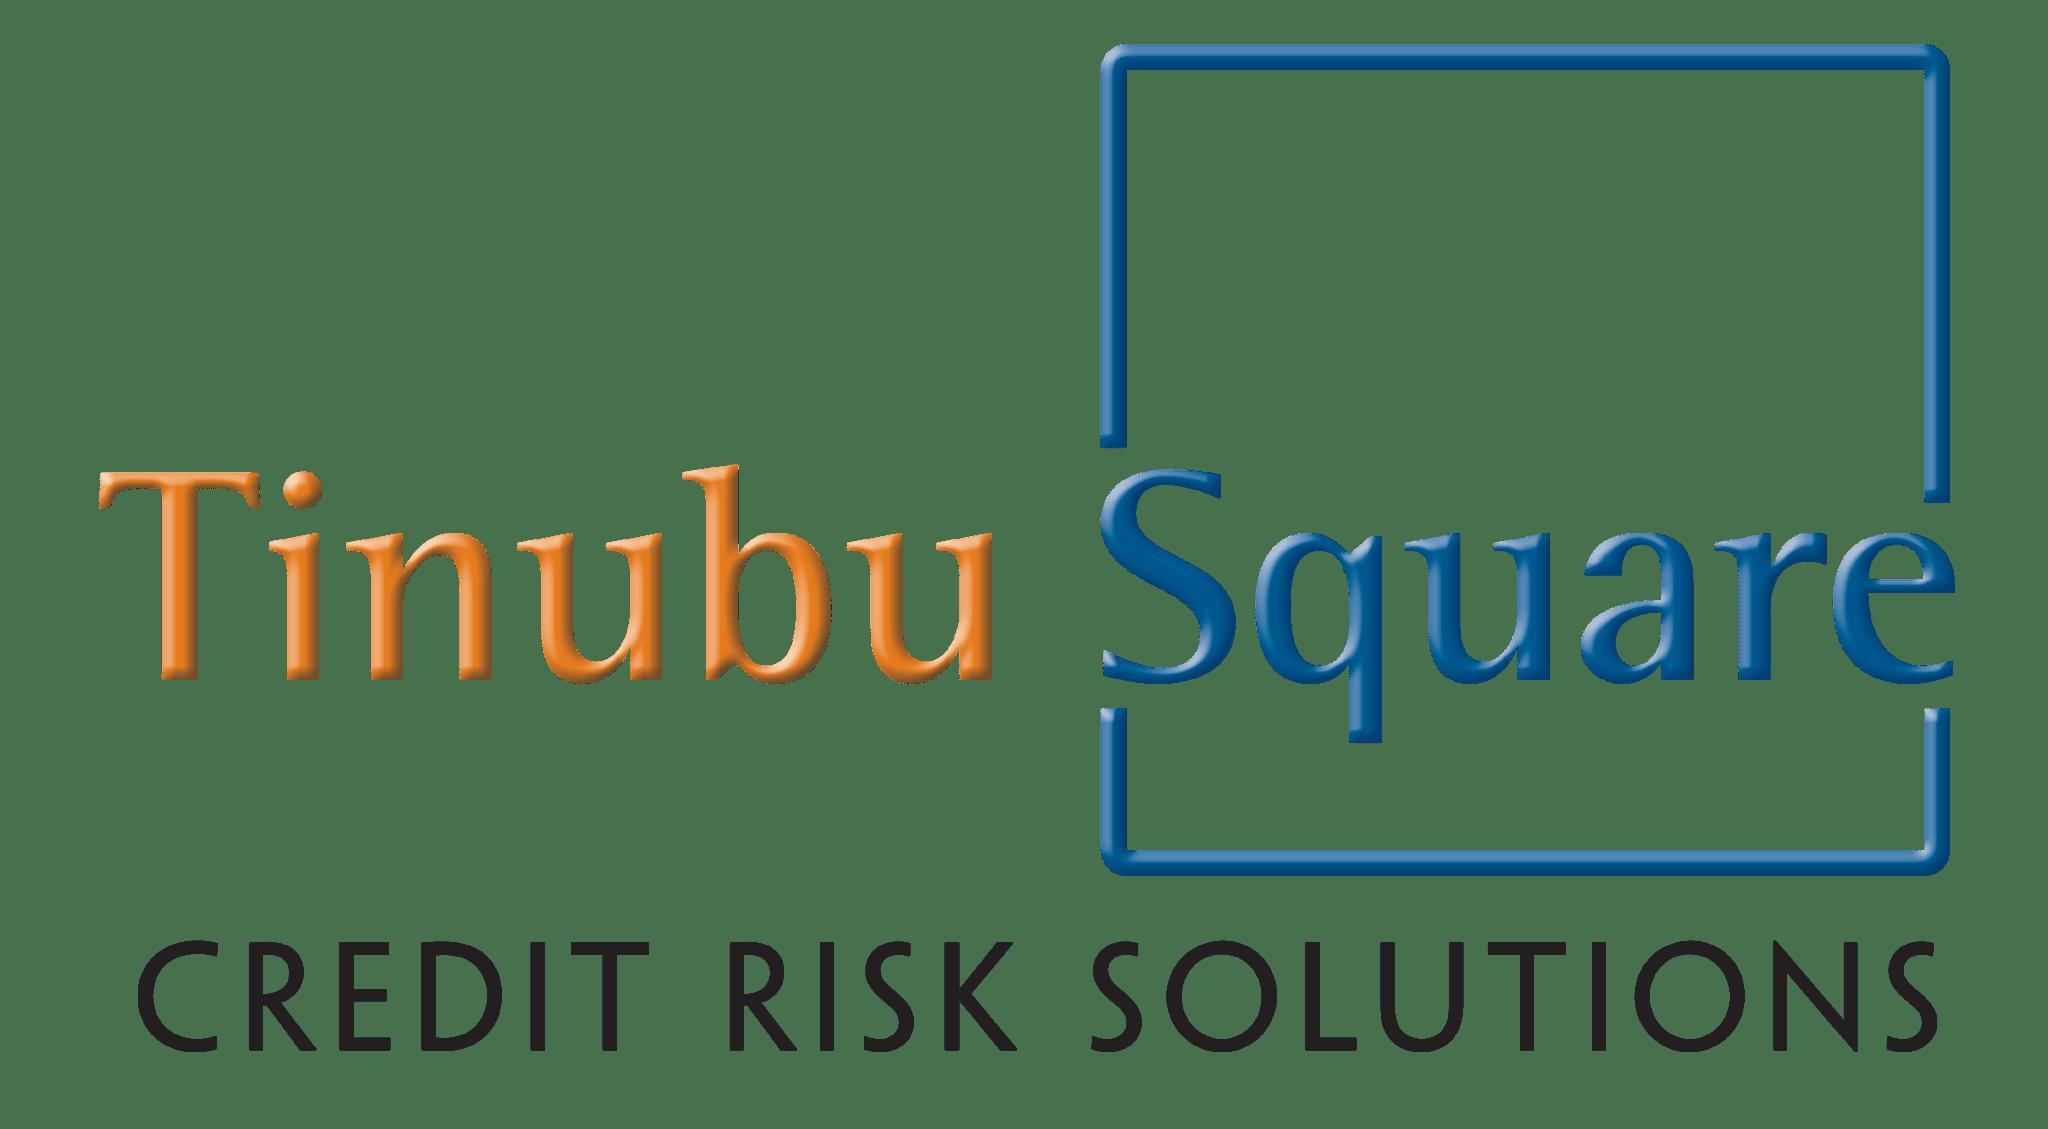 Tinubu Square company logo